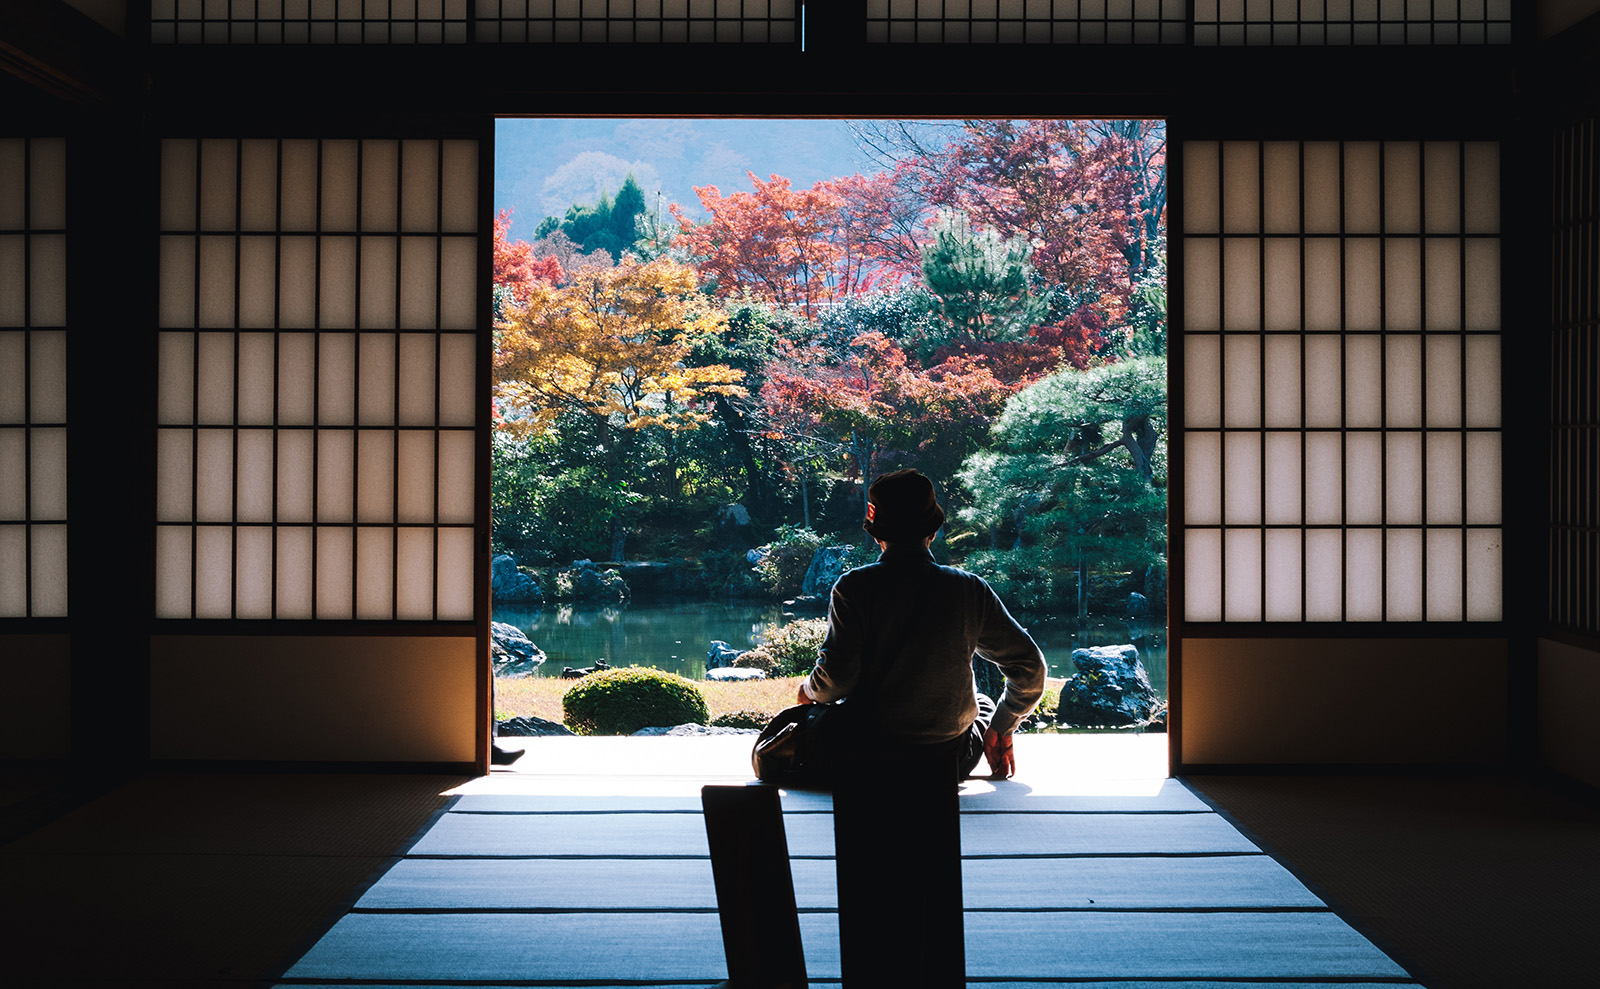 Tenryu-ji Temple, Kyoto-shi, Japan